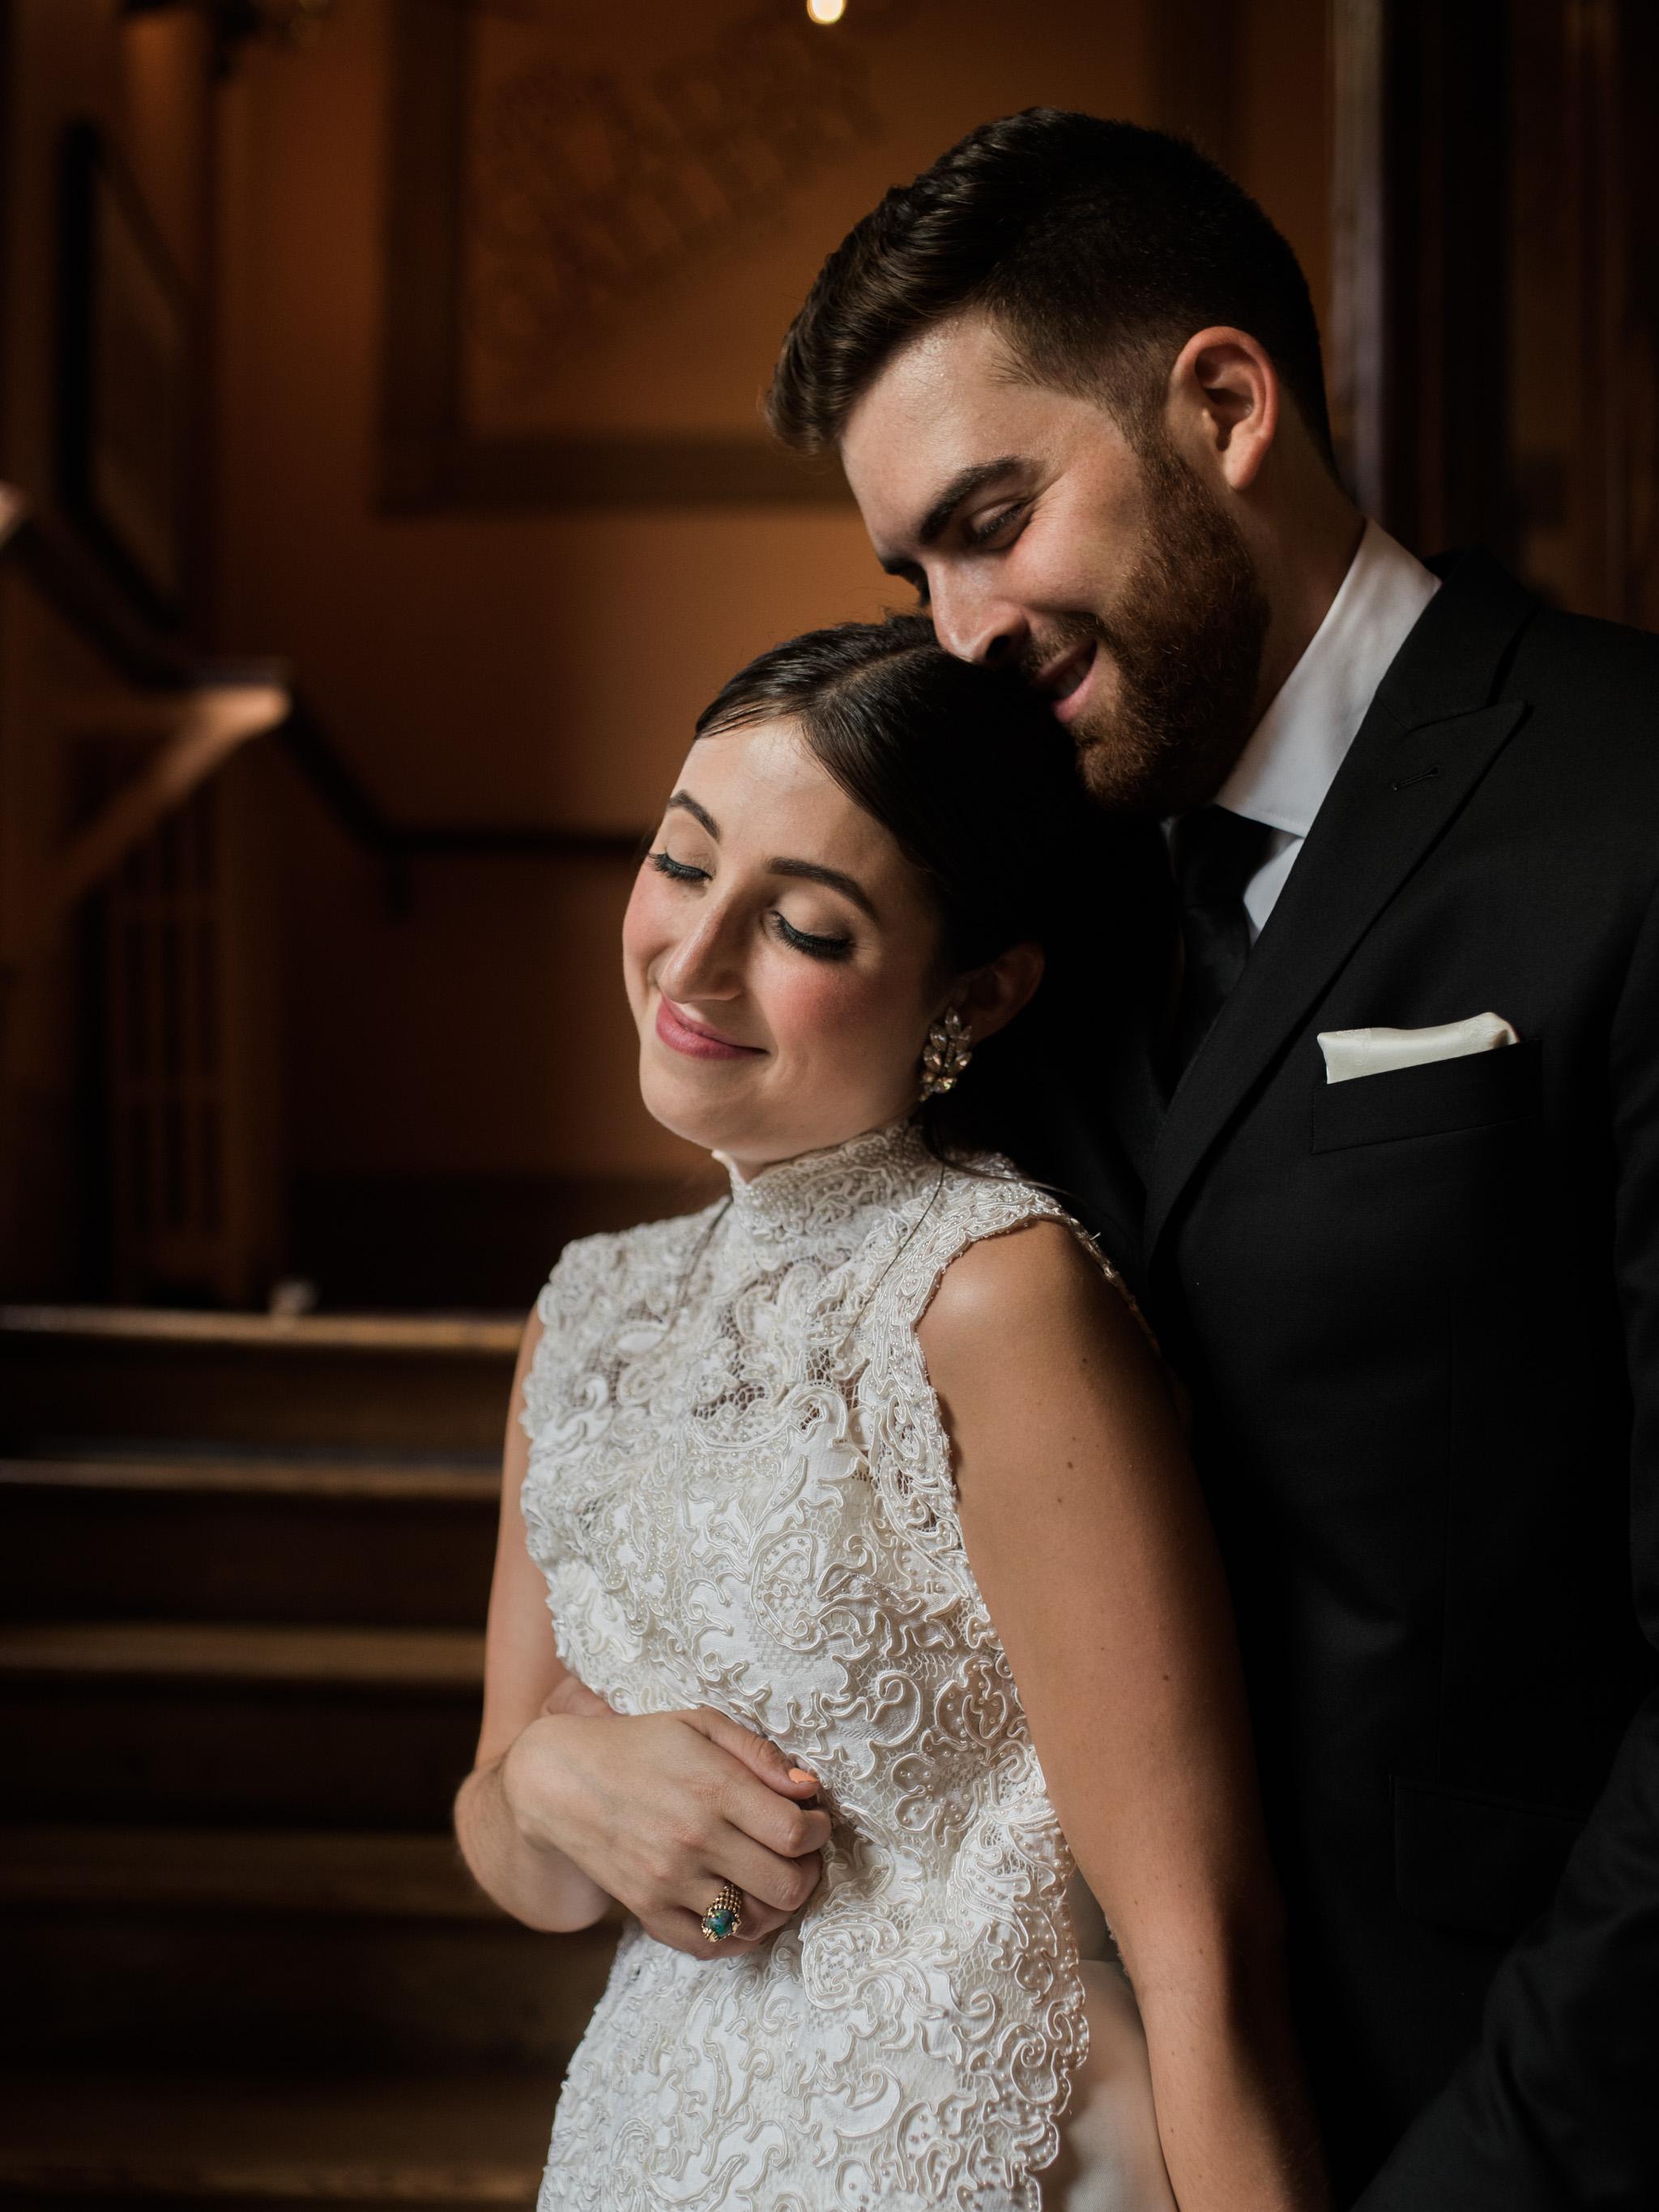 Gladstone-Toronto-Wedding-99-sudbury-24.jpg